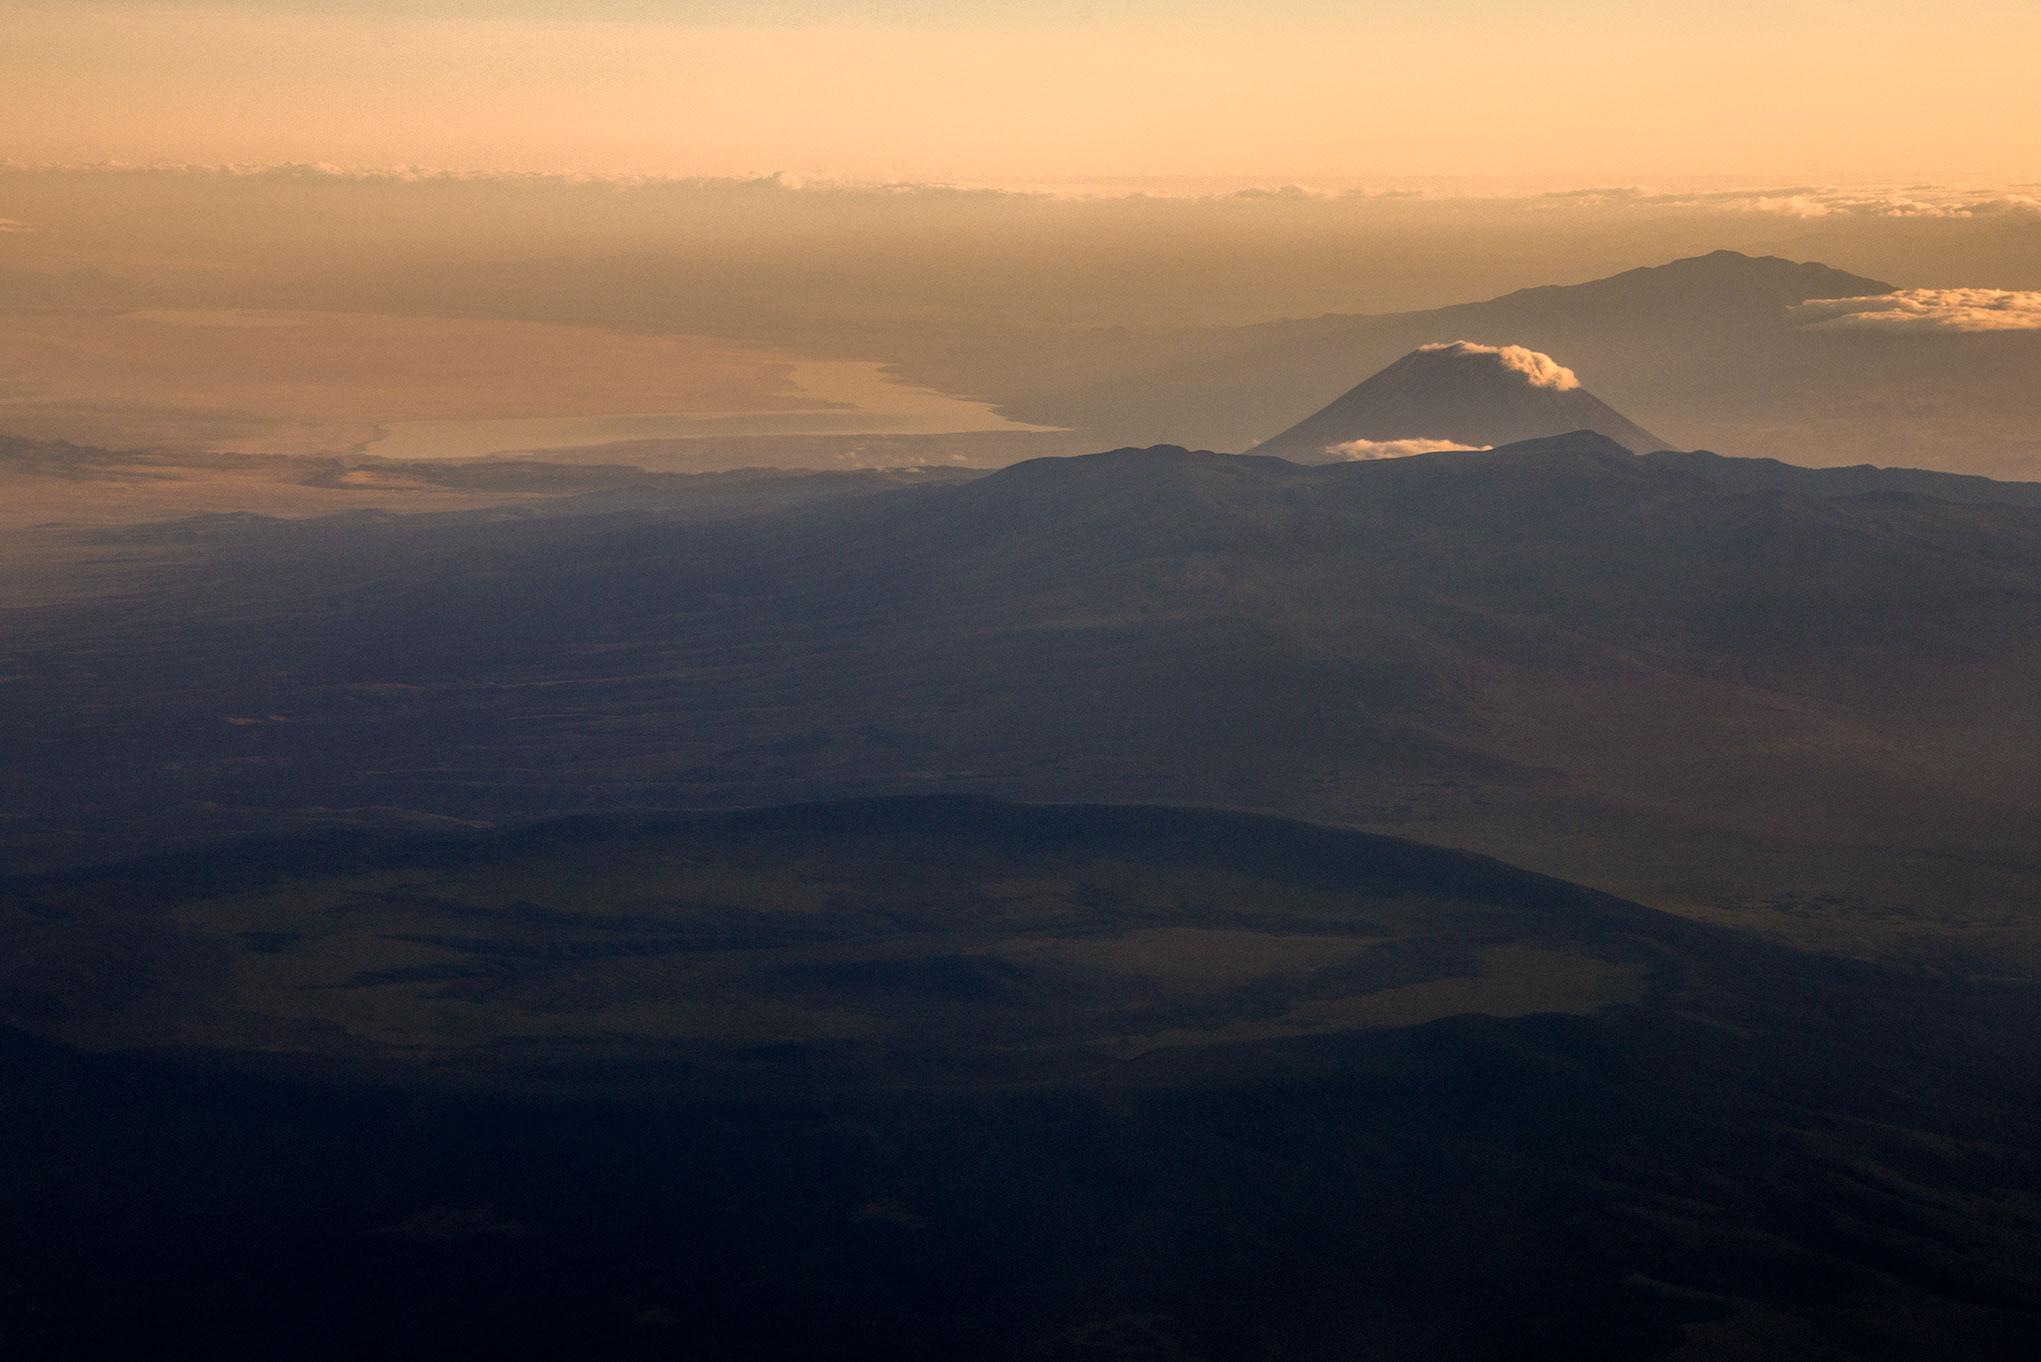 Four peaks, Tanzania